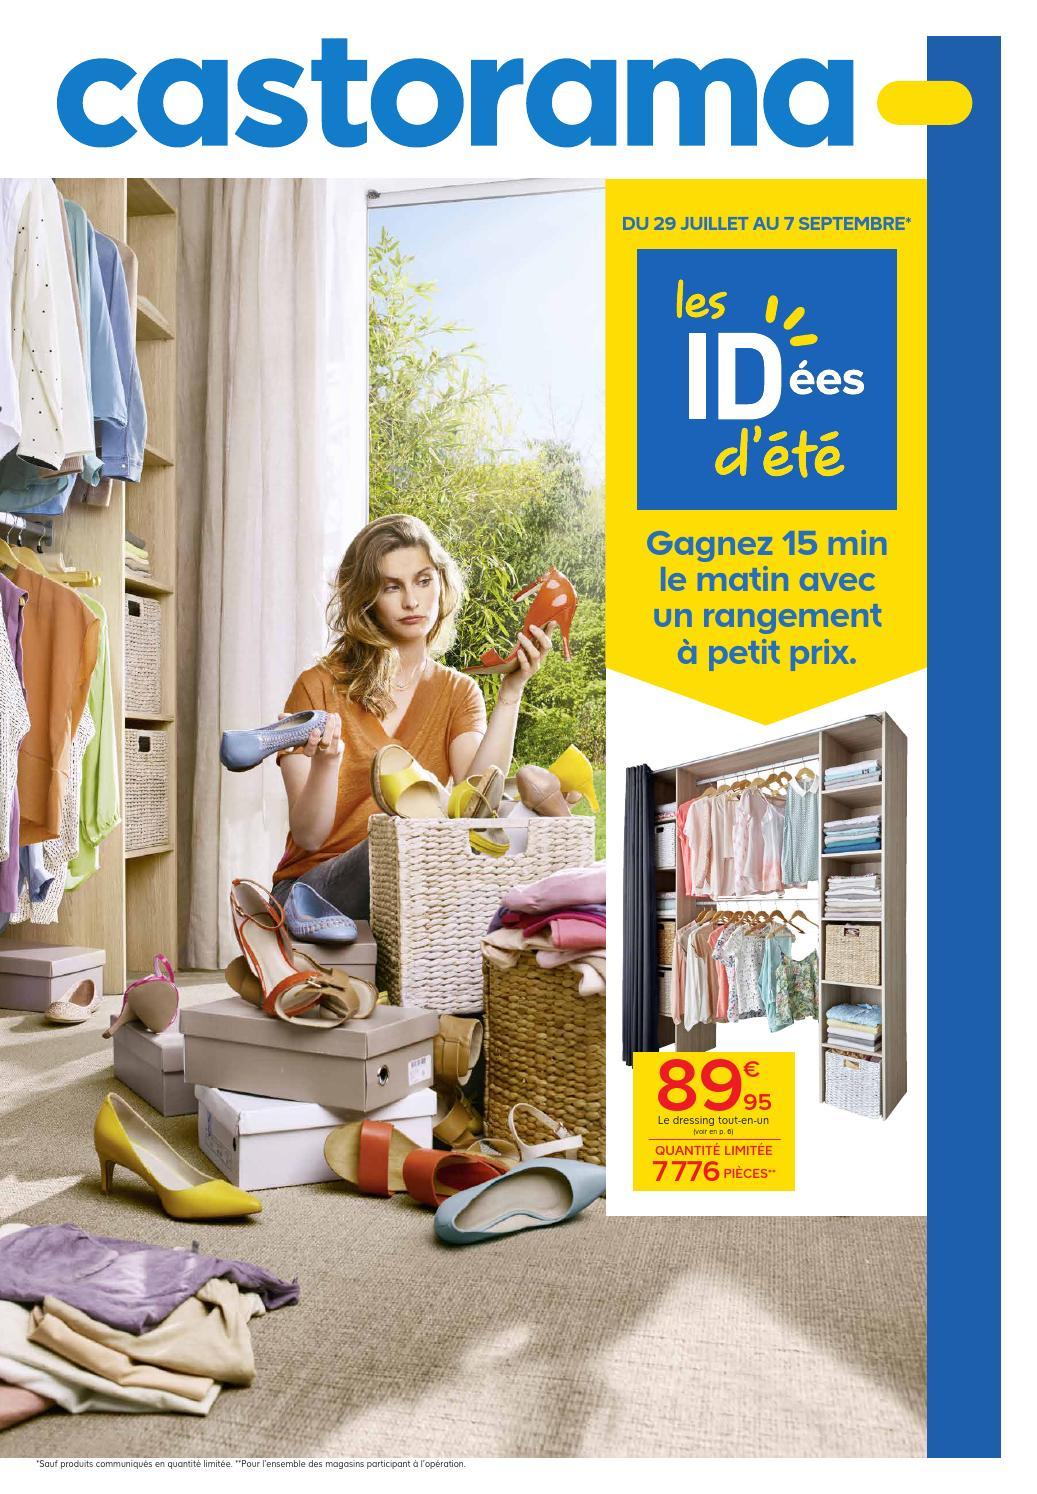 Castorama Catalogue 29juillet 7septembre2015 By